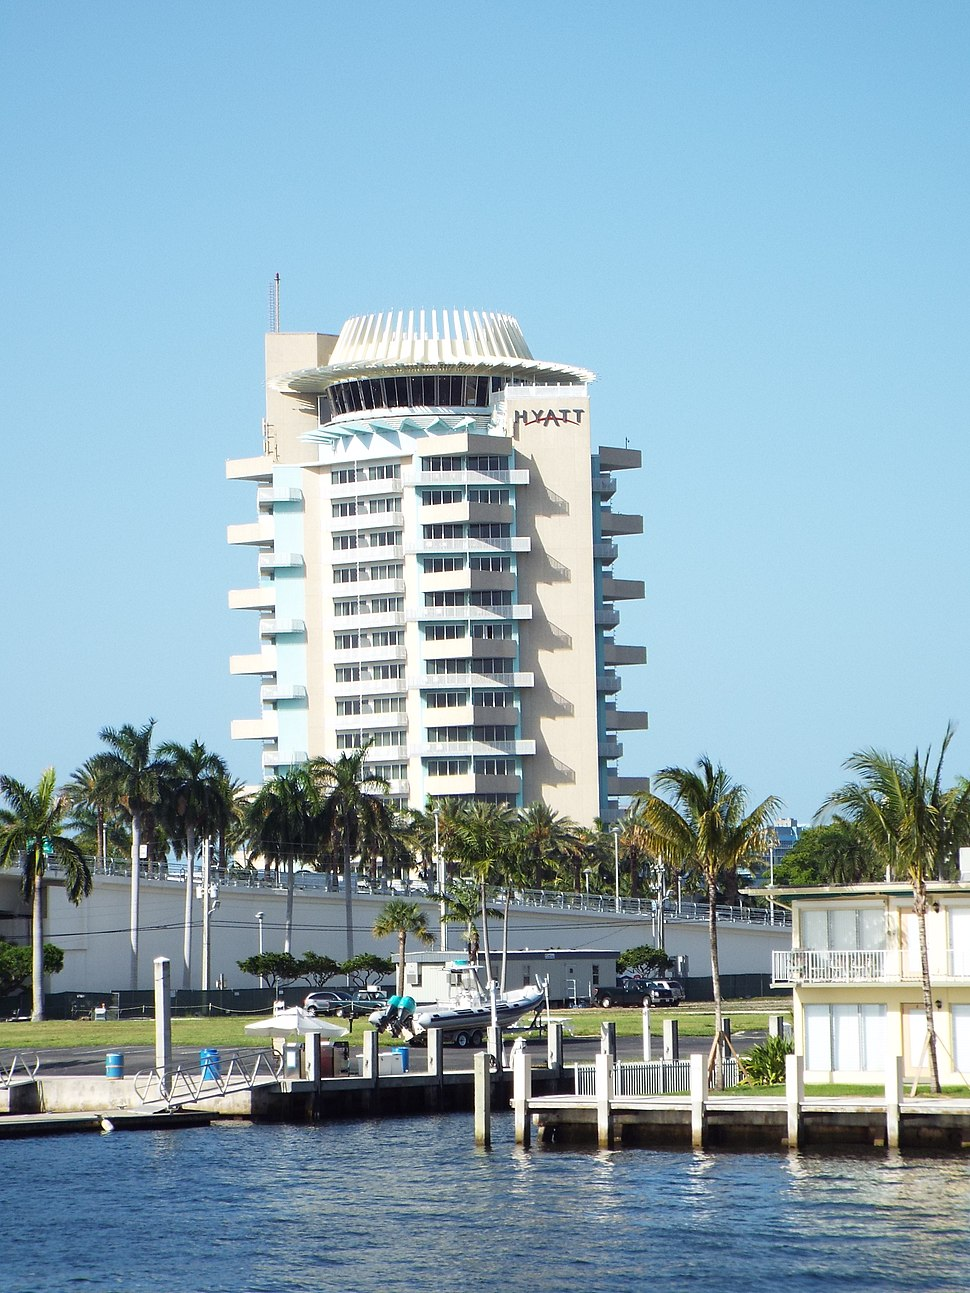 Florida-Fort Lauderdale Haytt Hotel-by FLW-1957